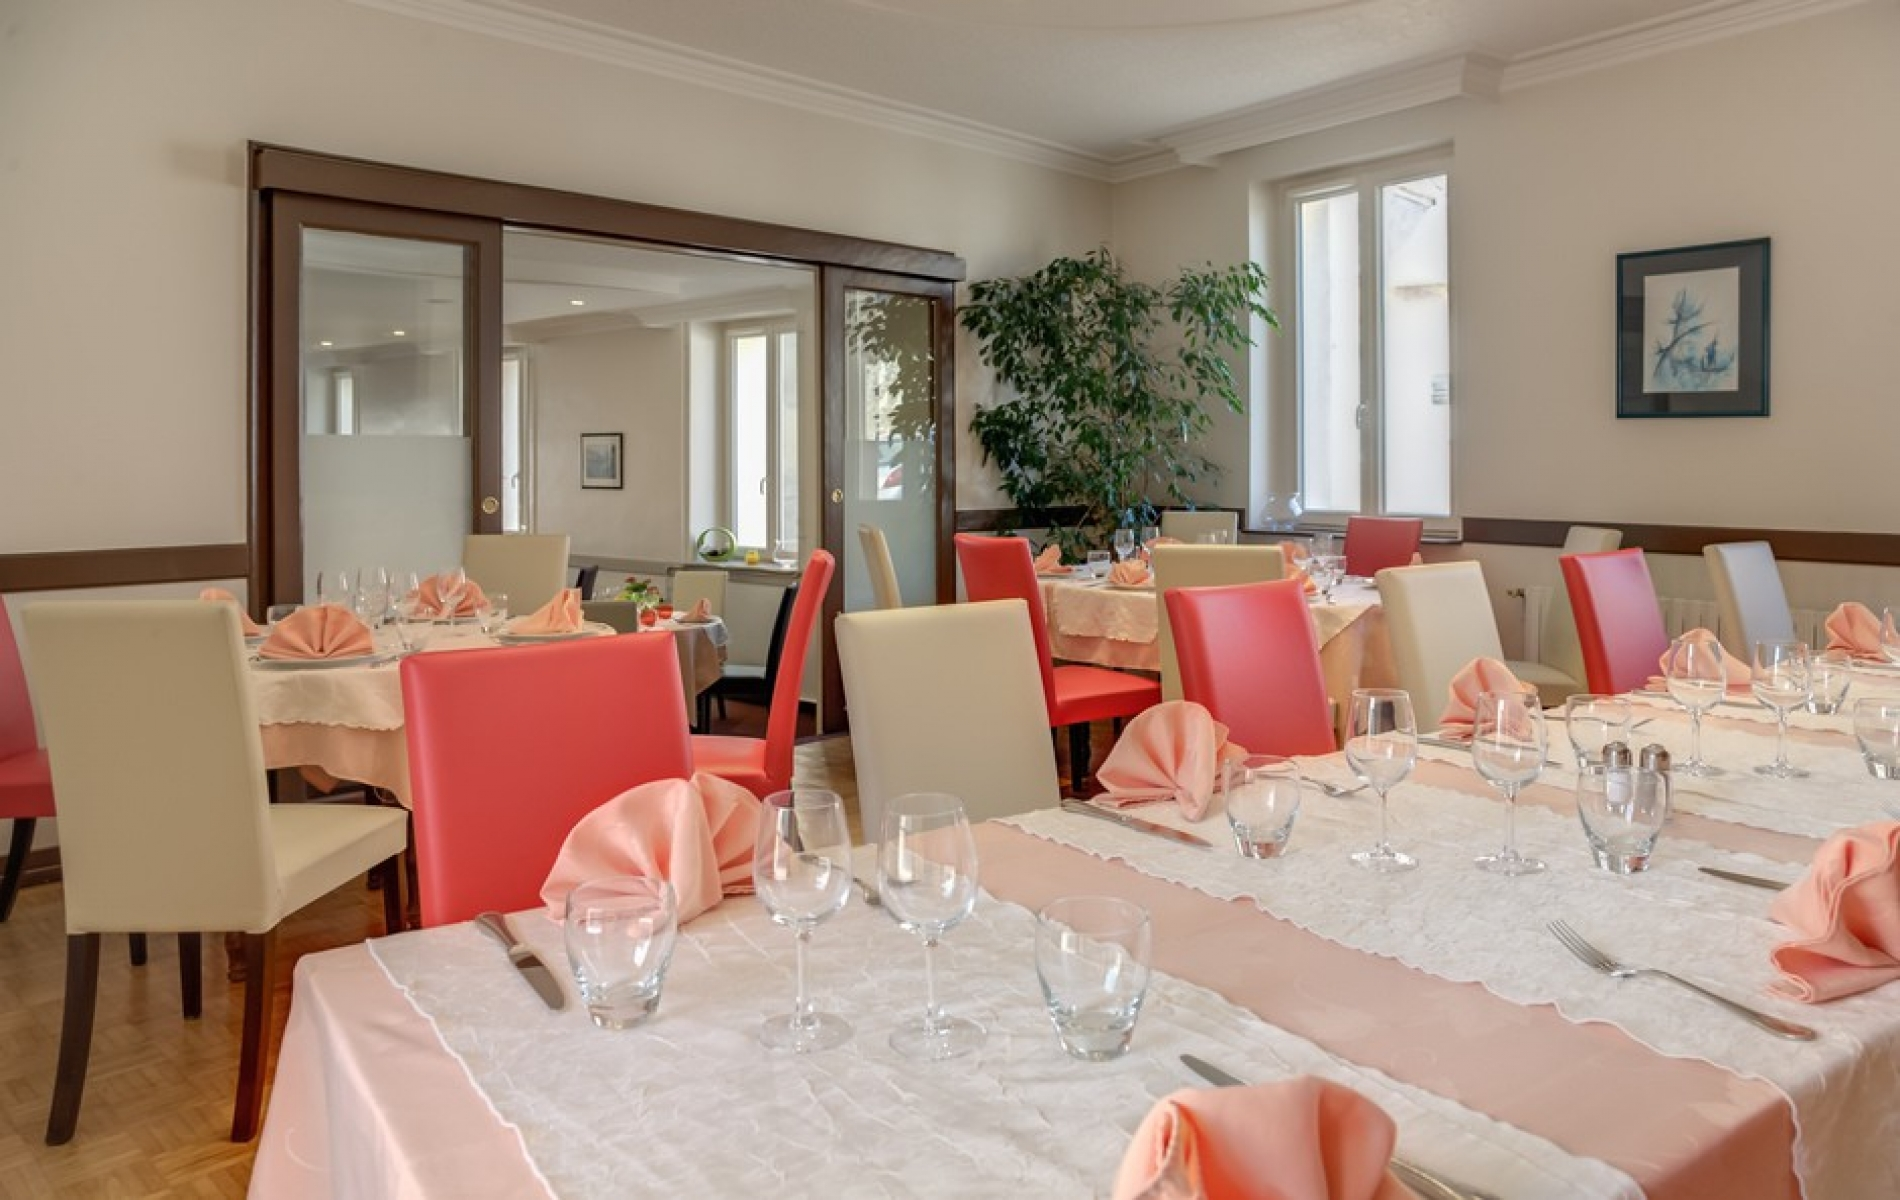 Restaurant de l'hotel de la barque proche Le Mans